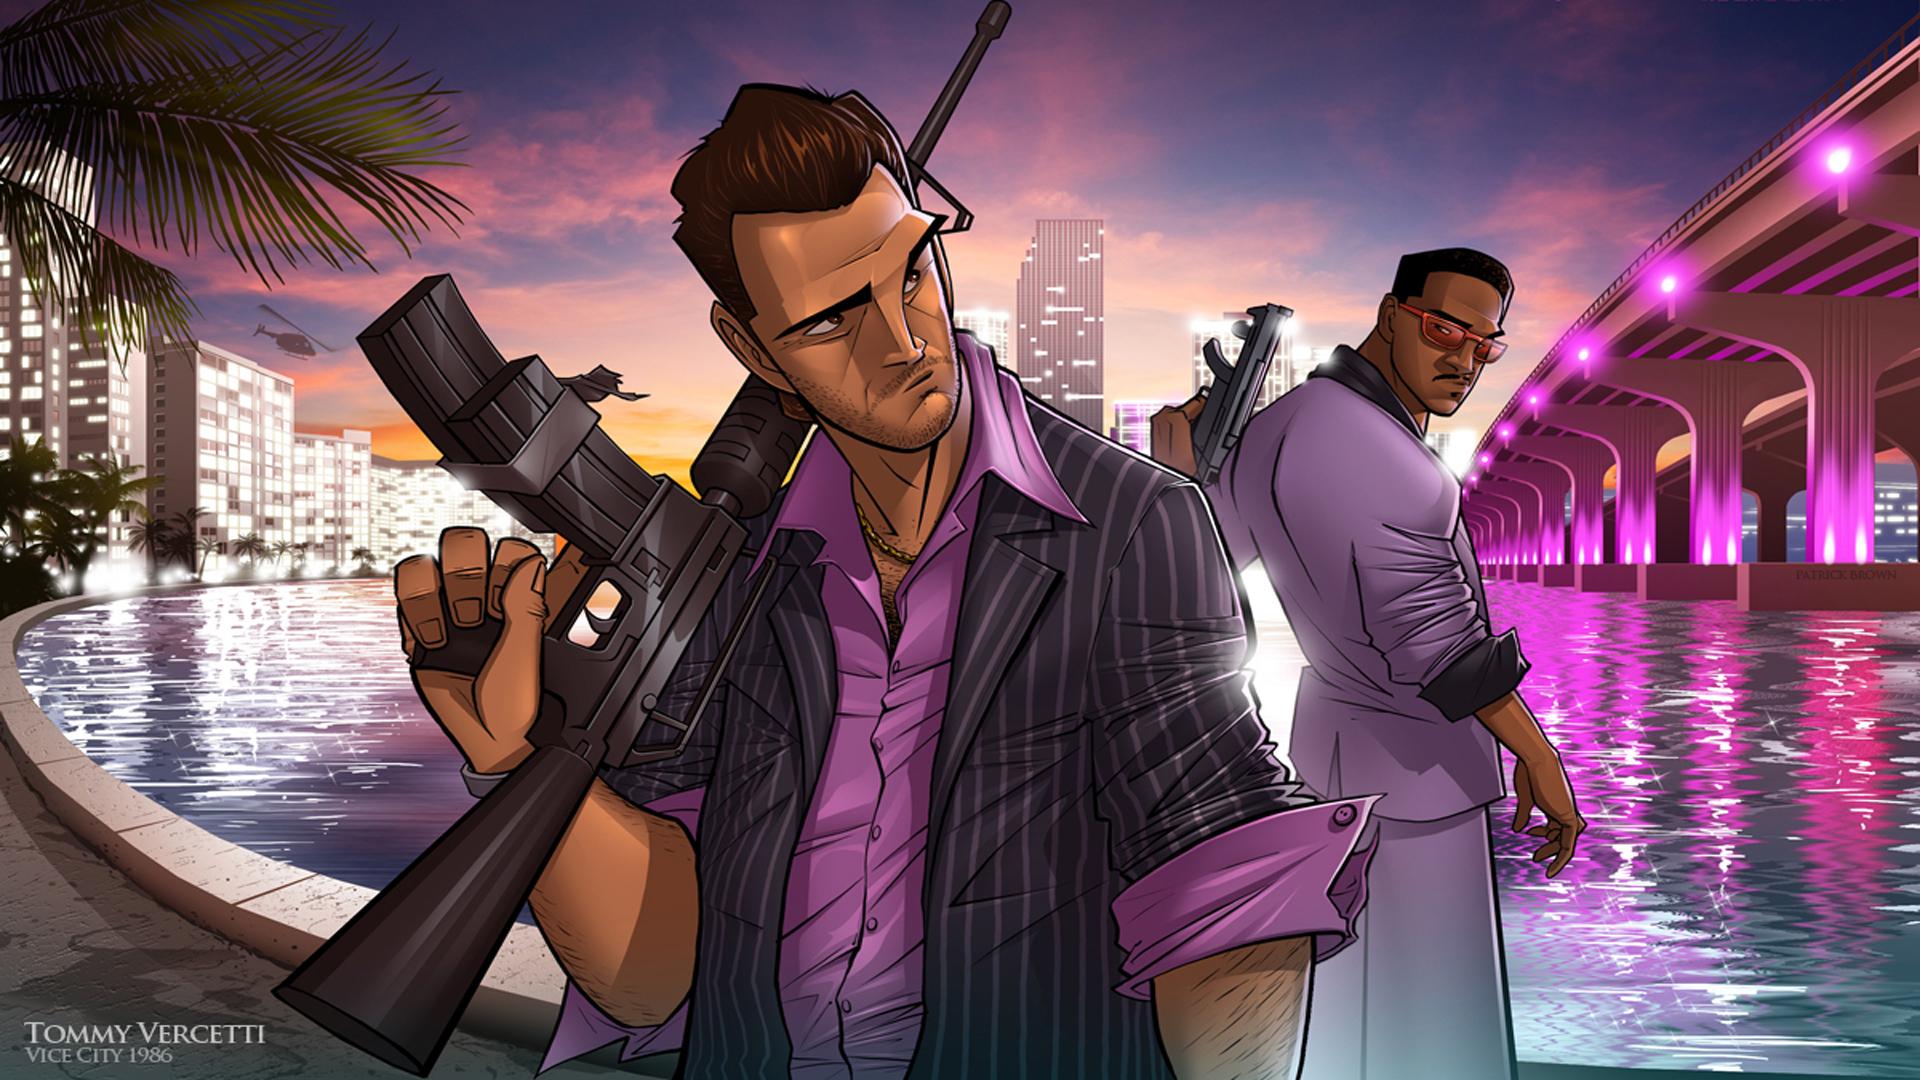 Tommy Vercetti Grand Theft Auto Vice City Wallpaper Hd Games 4k